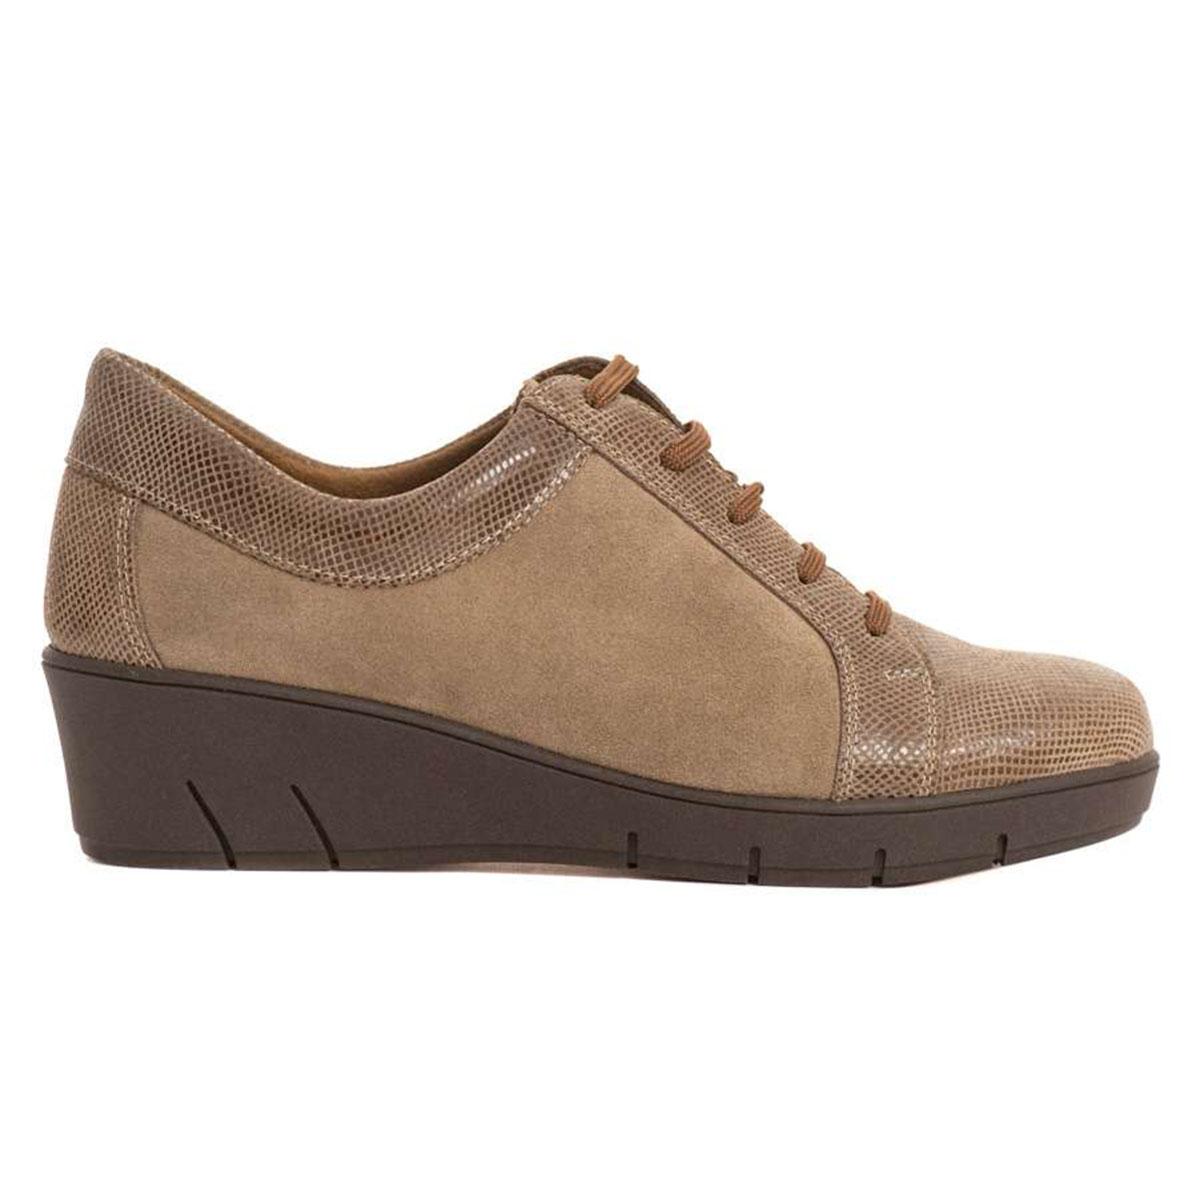 95d1bdd5c9 RAGAZZA 0313 Γυναικείο Παπούτσι Δετό Γνήσιο Καστόρι Πούρο – ILoveMyShoes